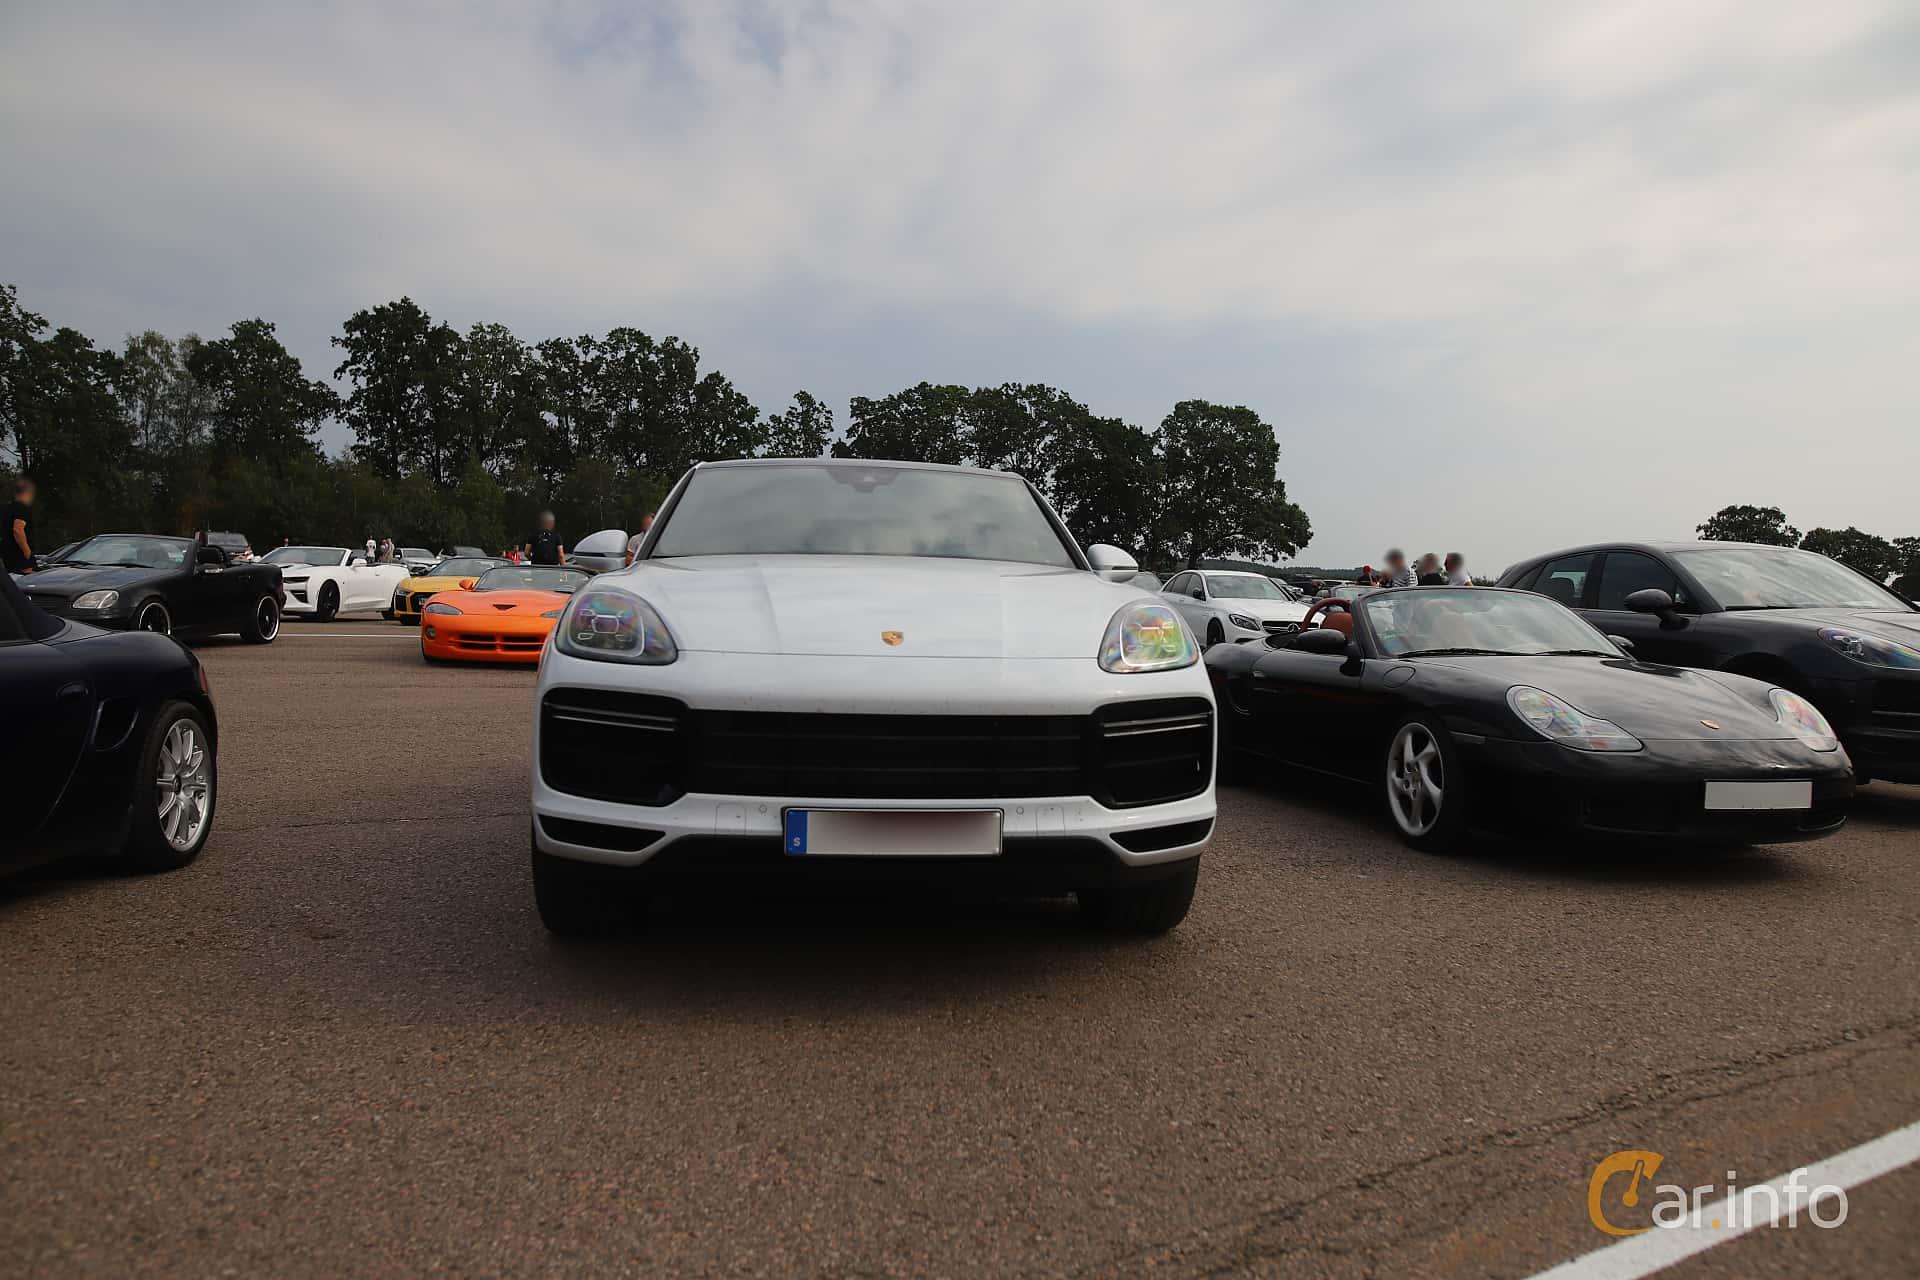 Porsche Cayenne Turbo  TipTronic S, 550hp, 2020 at Autoropa Racing day Knutstorp 2019